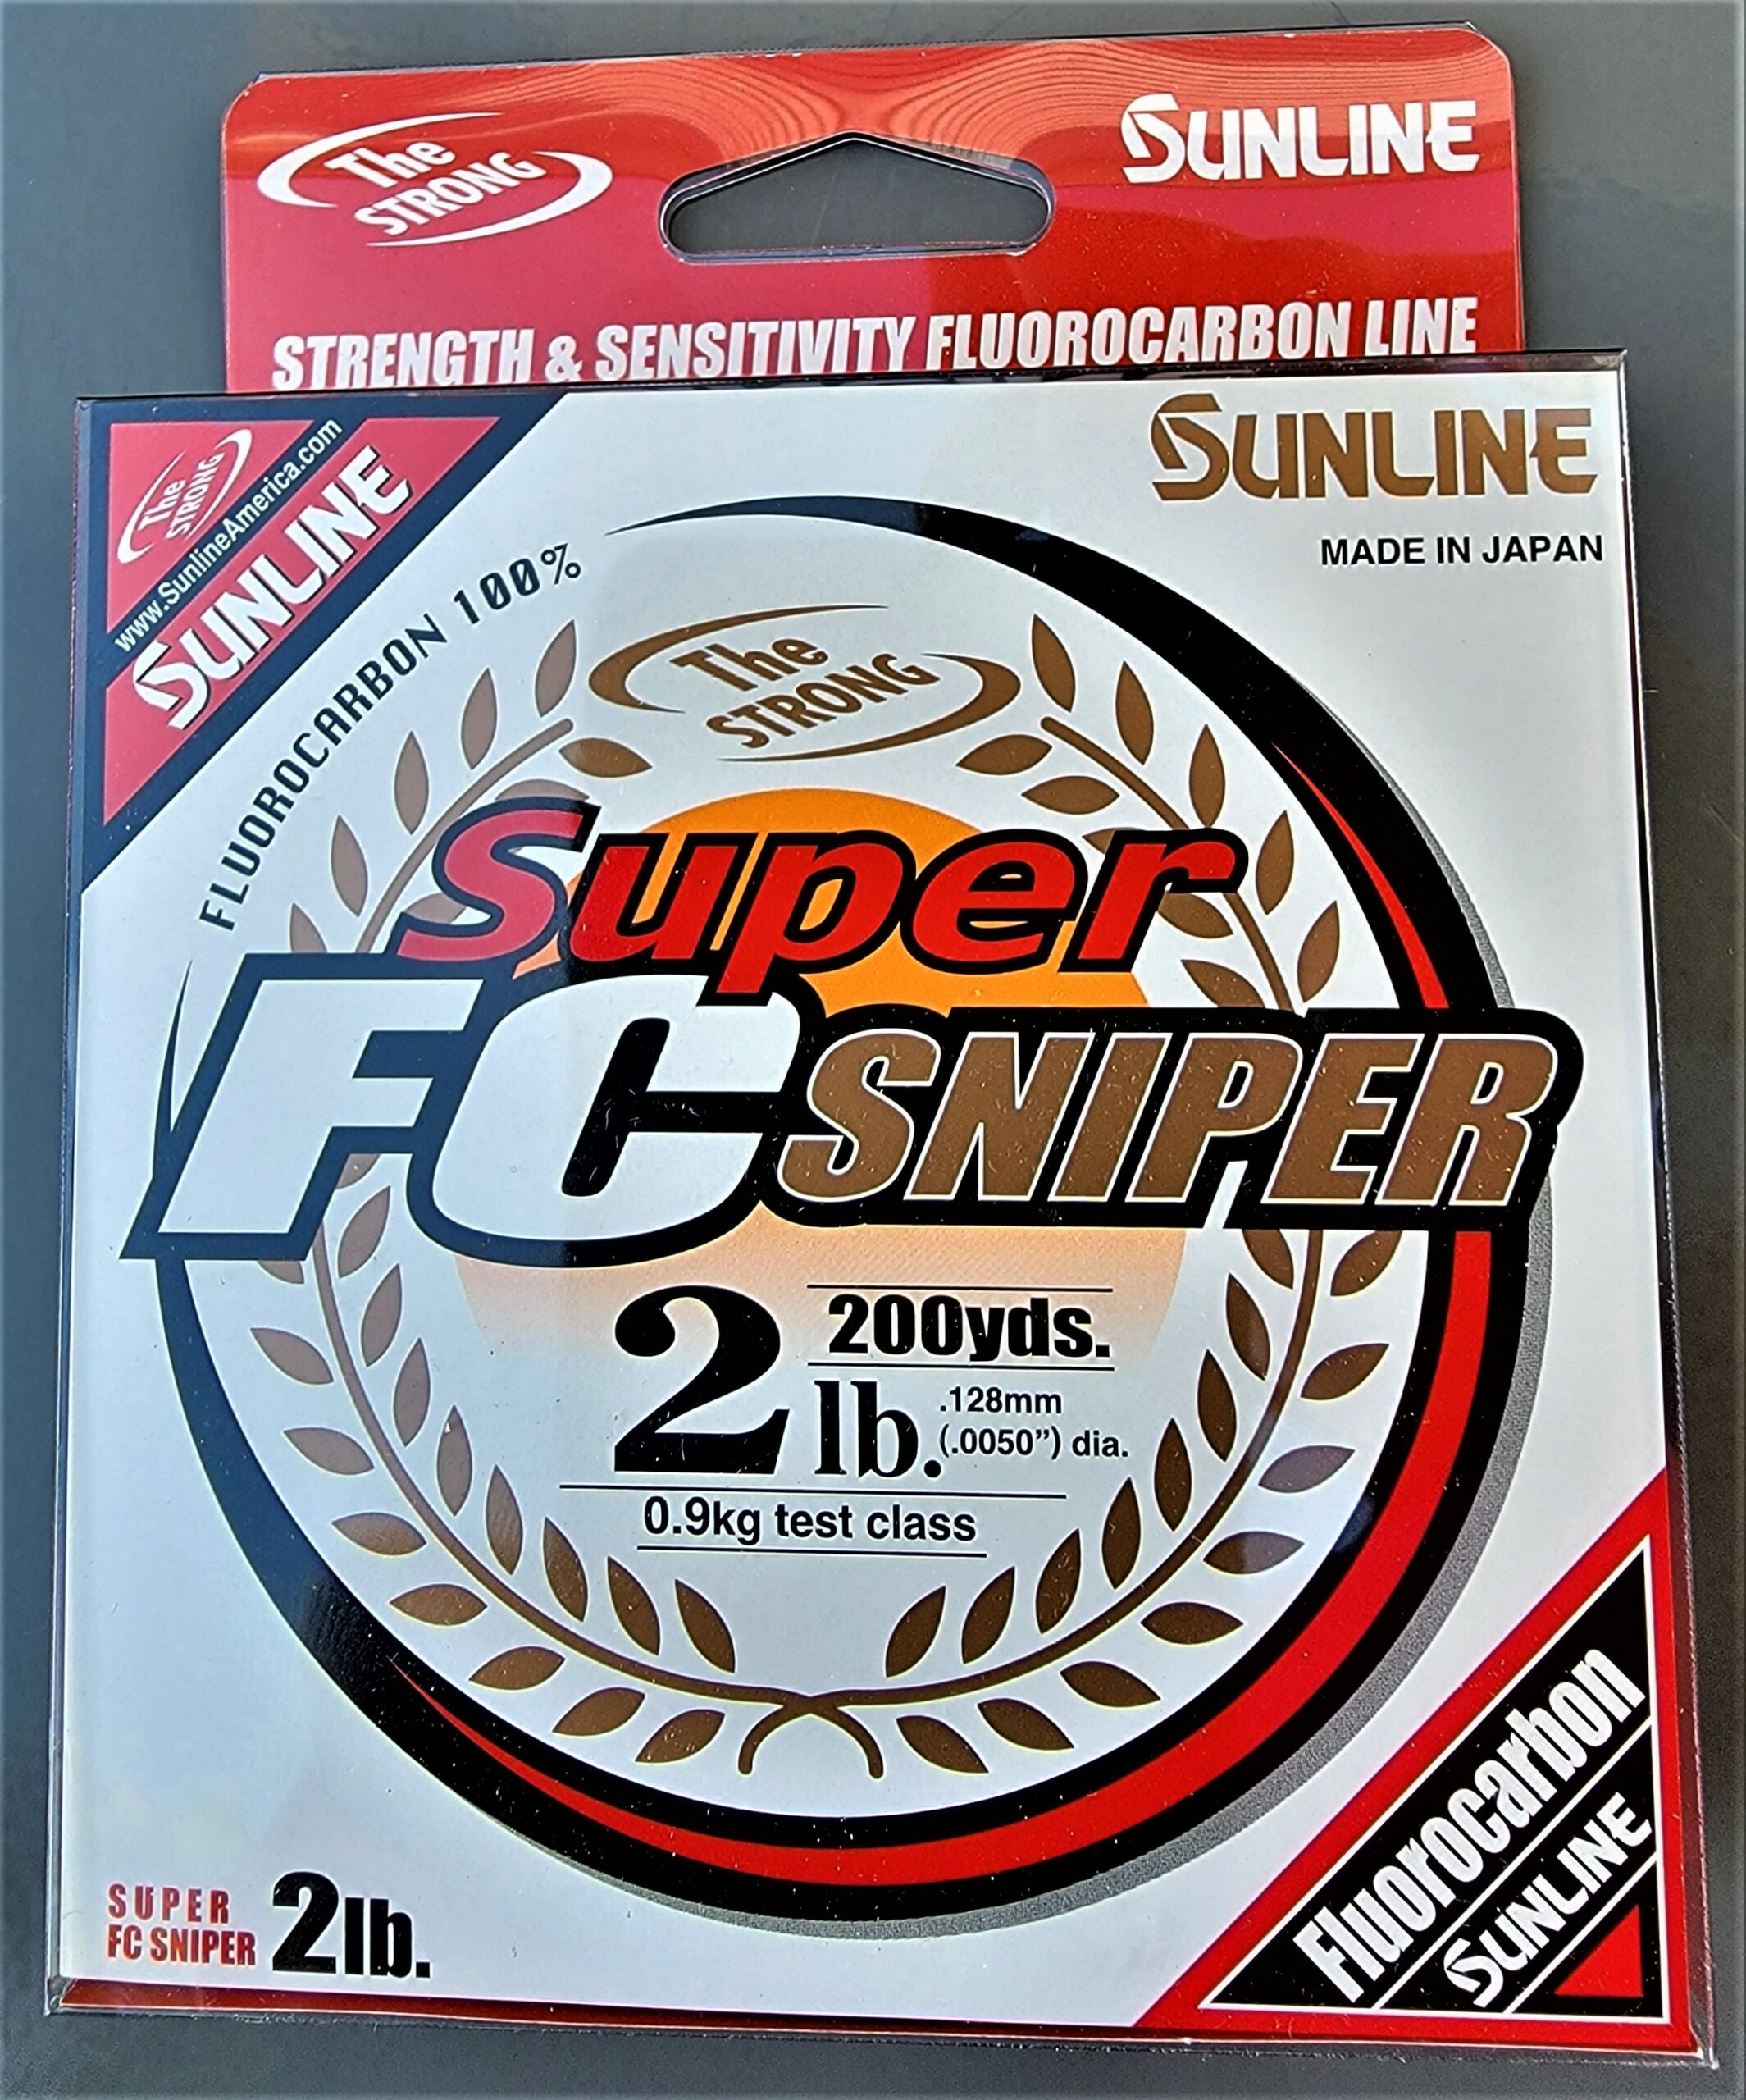 Sunline - Super FC Sniper - 200 YD - Super FC Sniper - 2 LB - Natural Clear